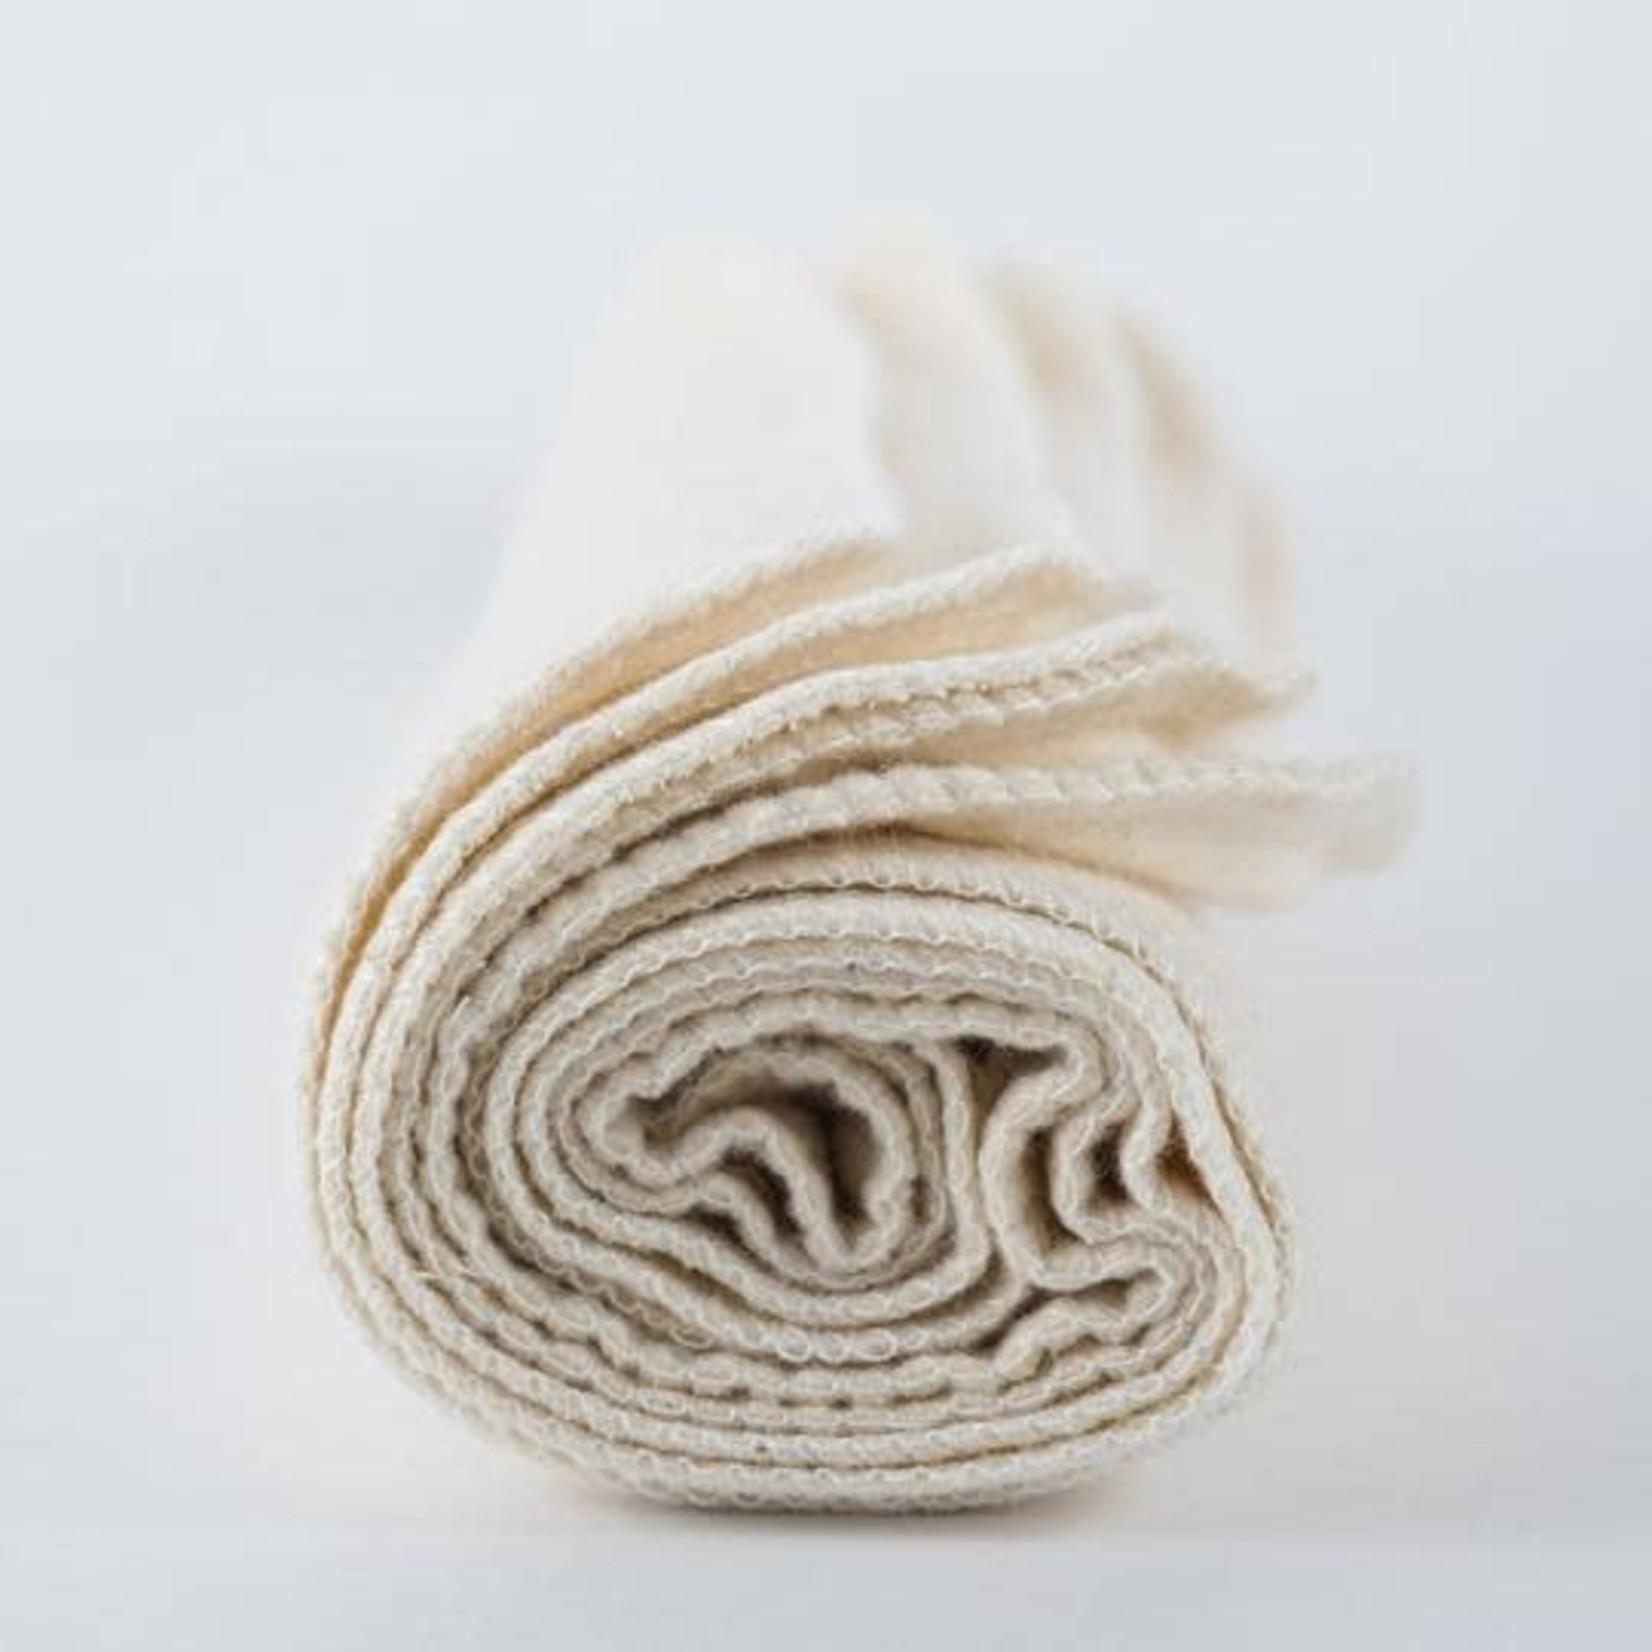 Cheeksahoy Unpaper towel - Cheeksahoy - Ivory